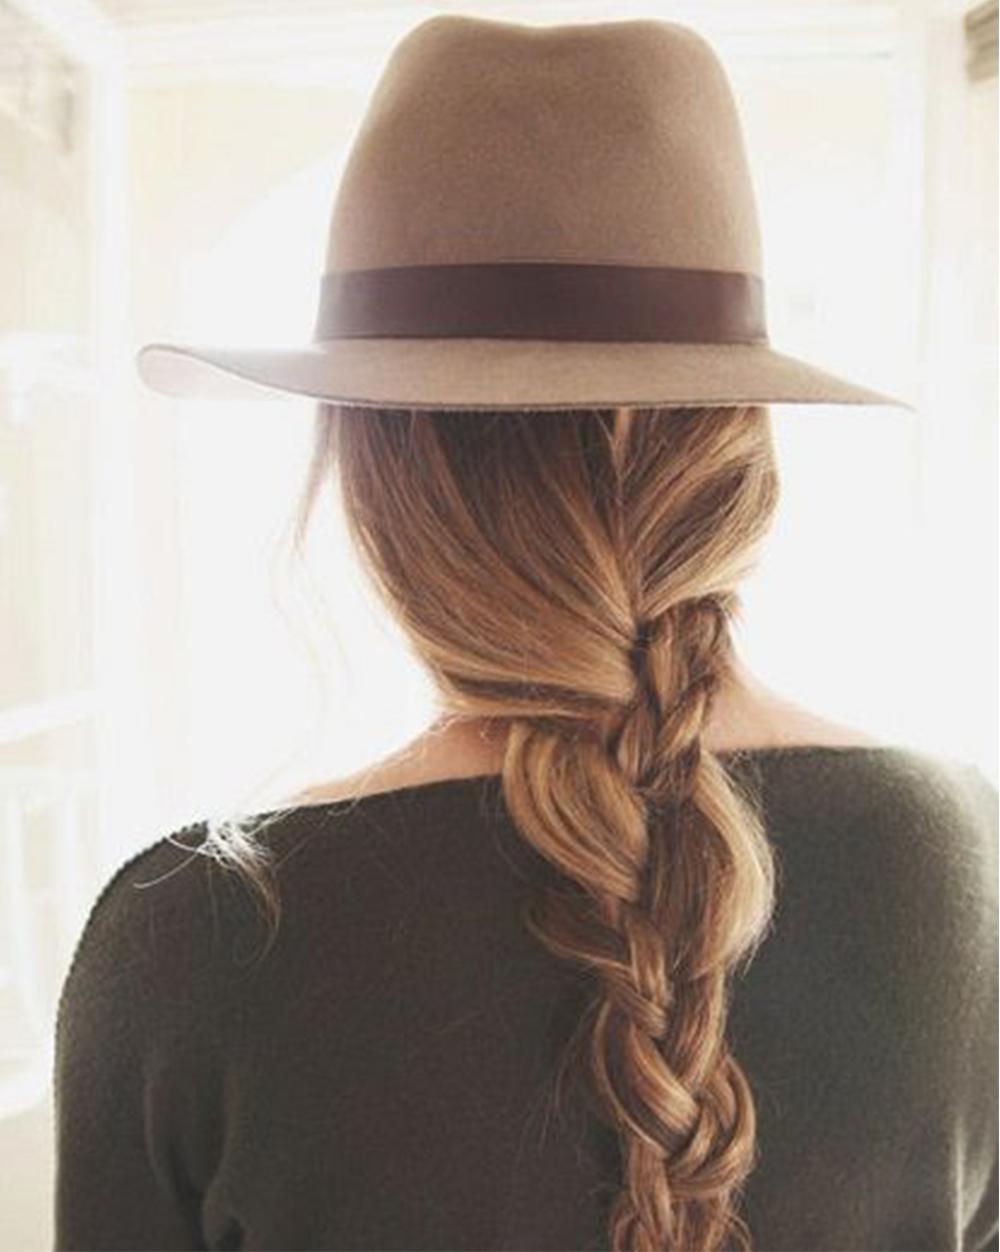 Style Hair Ideas - Image via Pinterest